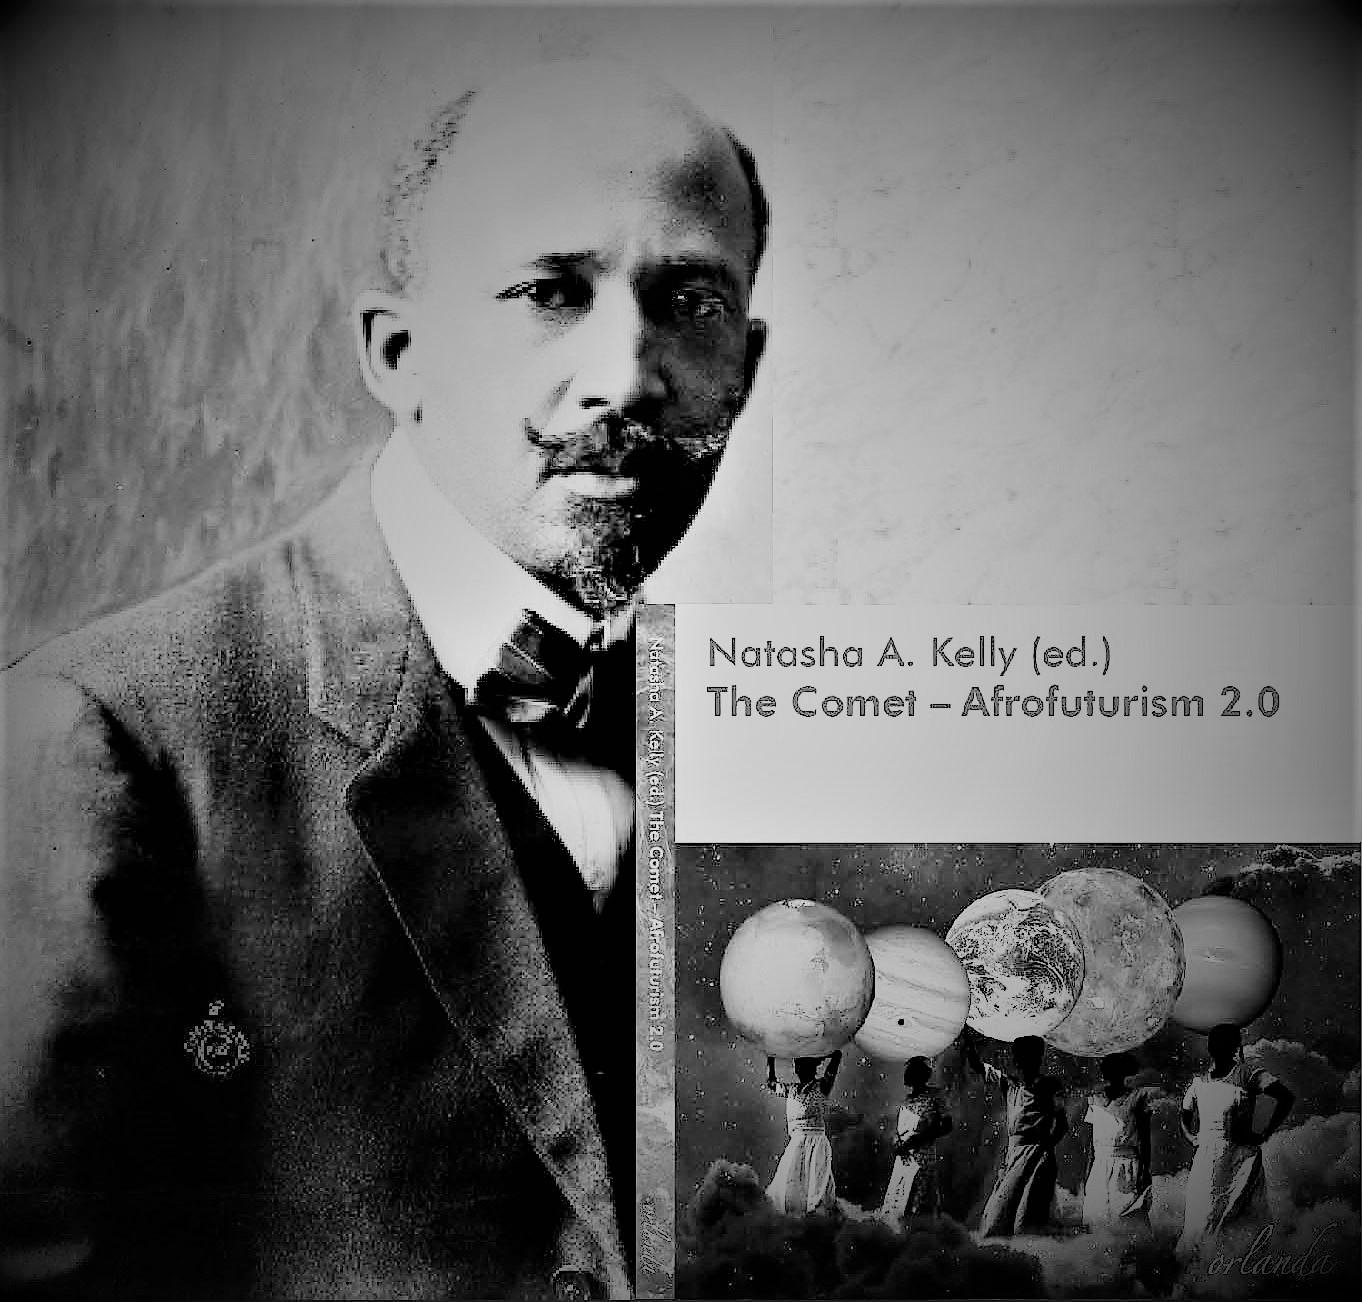 Afrofuturism 2.0 – a legacy of W.E.B. Du Bois